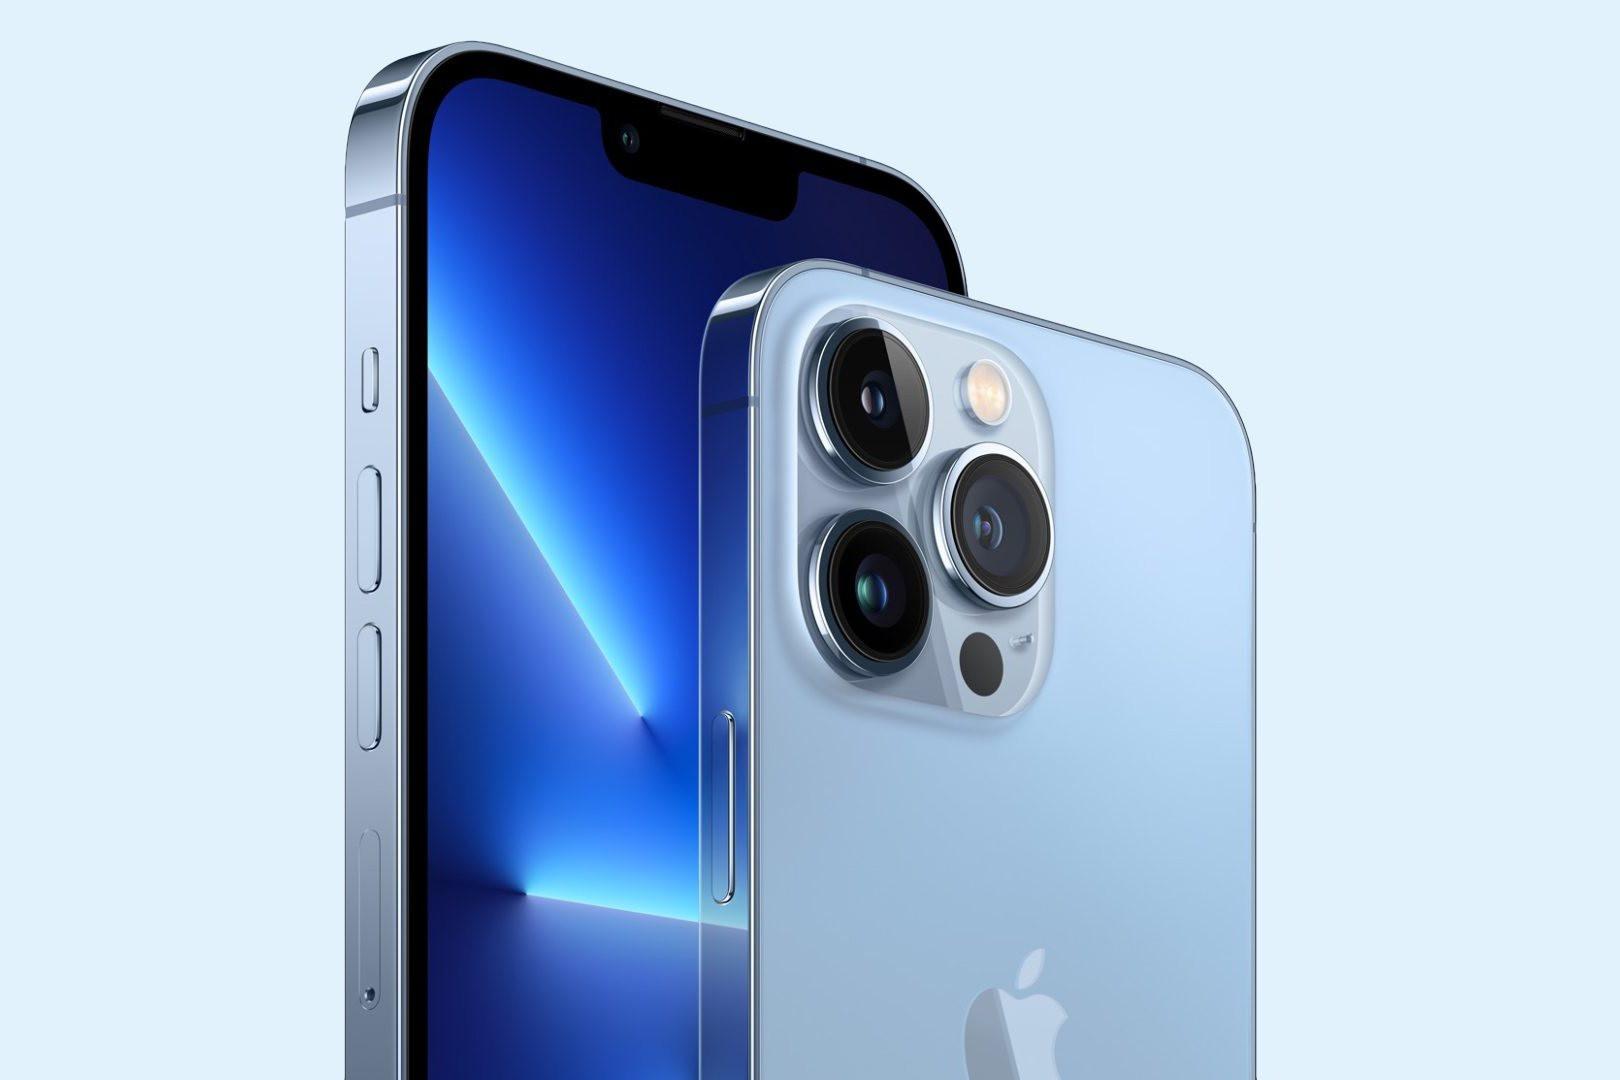 iphone-13-pro-max.jpg